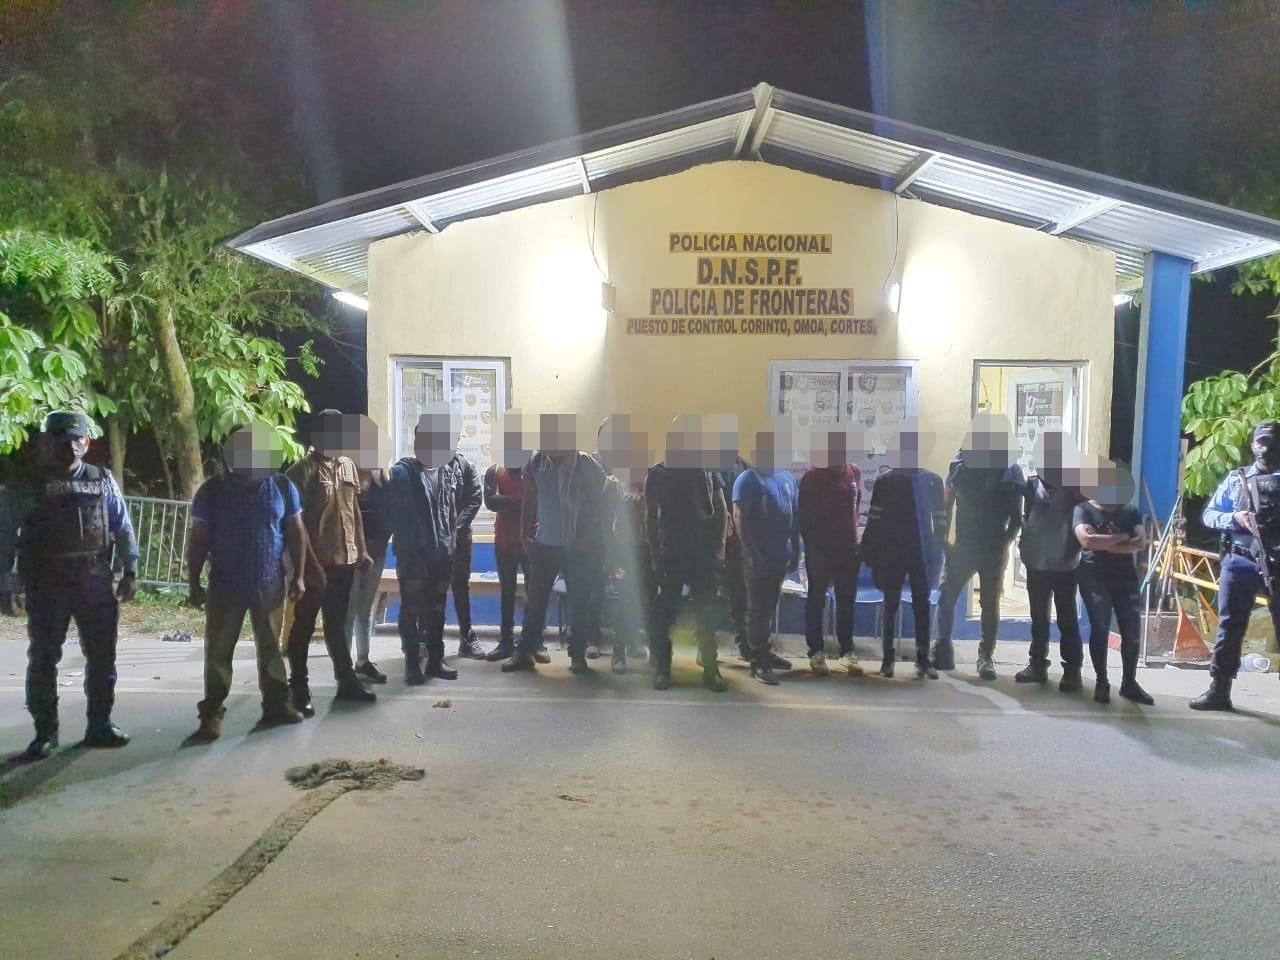 Honduras detiene a guatemaltecos por llevar ilegalmente a 16 nicas Tegucigalpa. Agencias